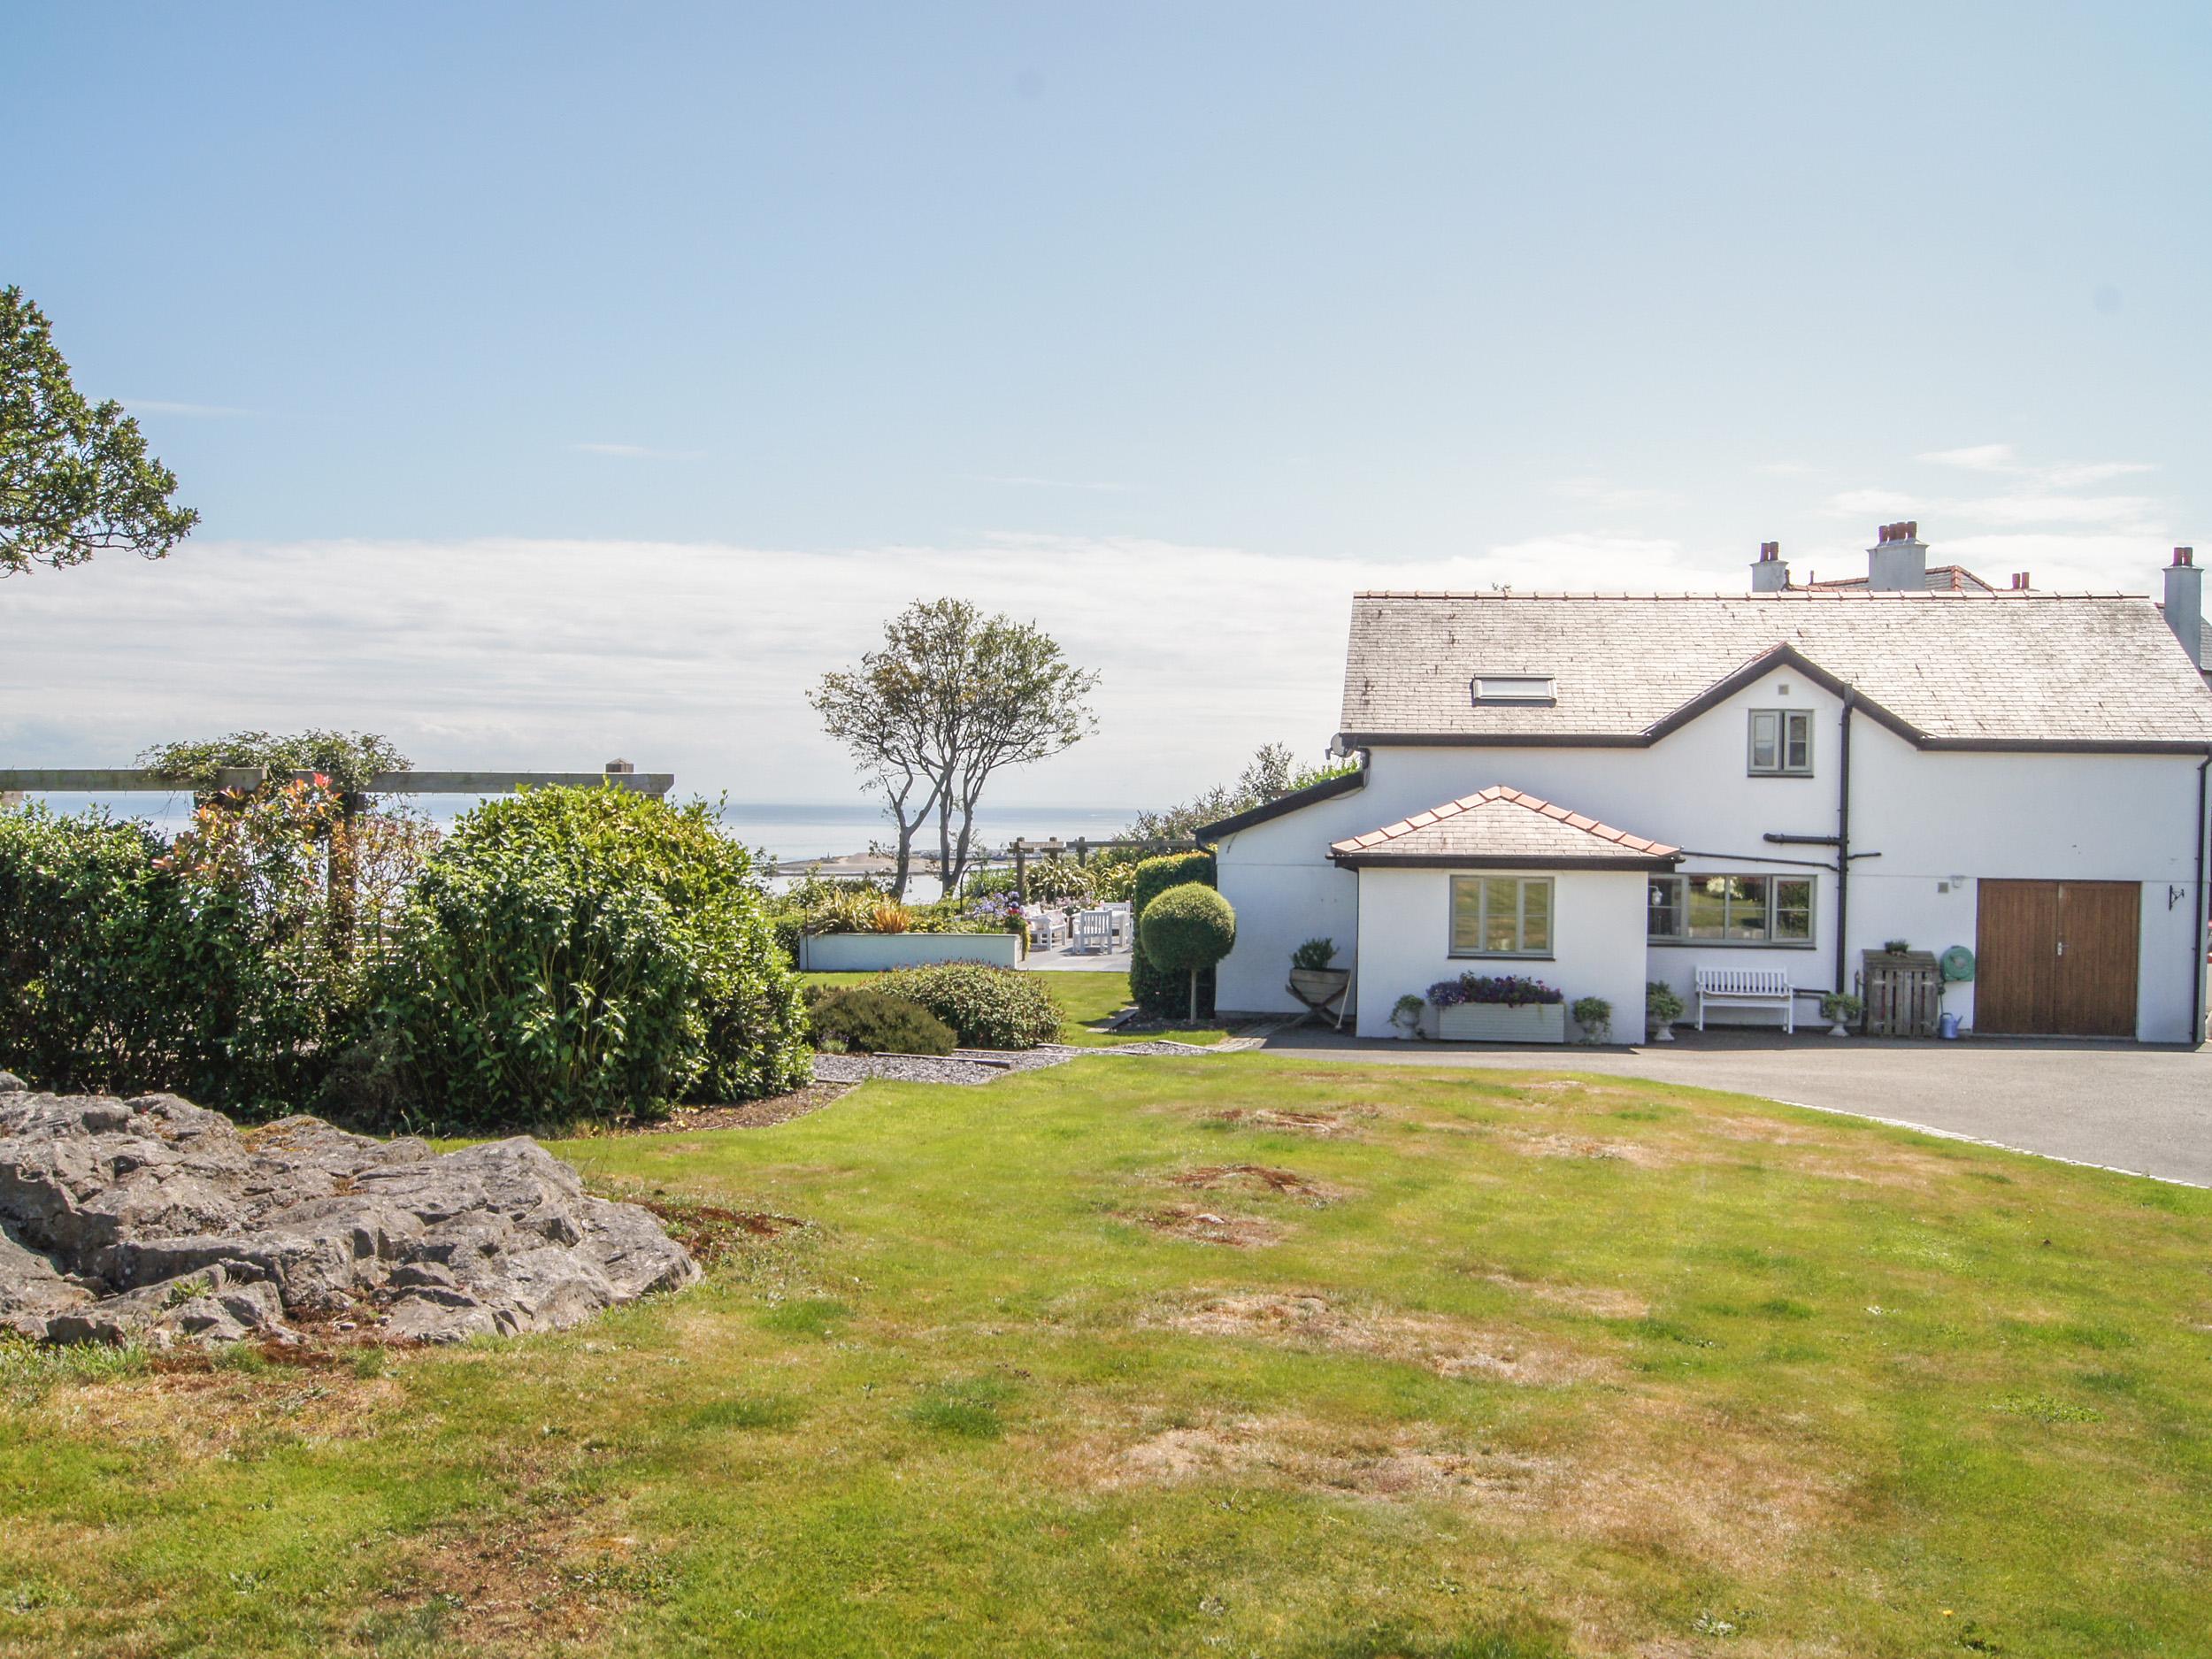 5 bedroom Cottage for rent in Pwllheli